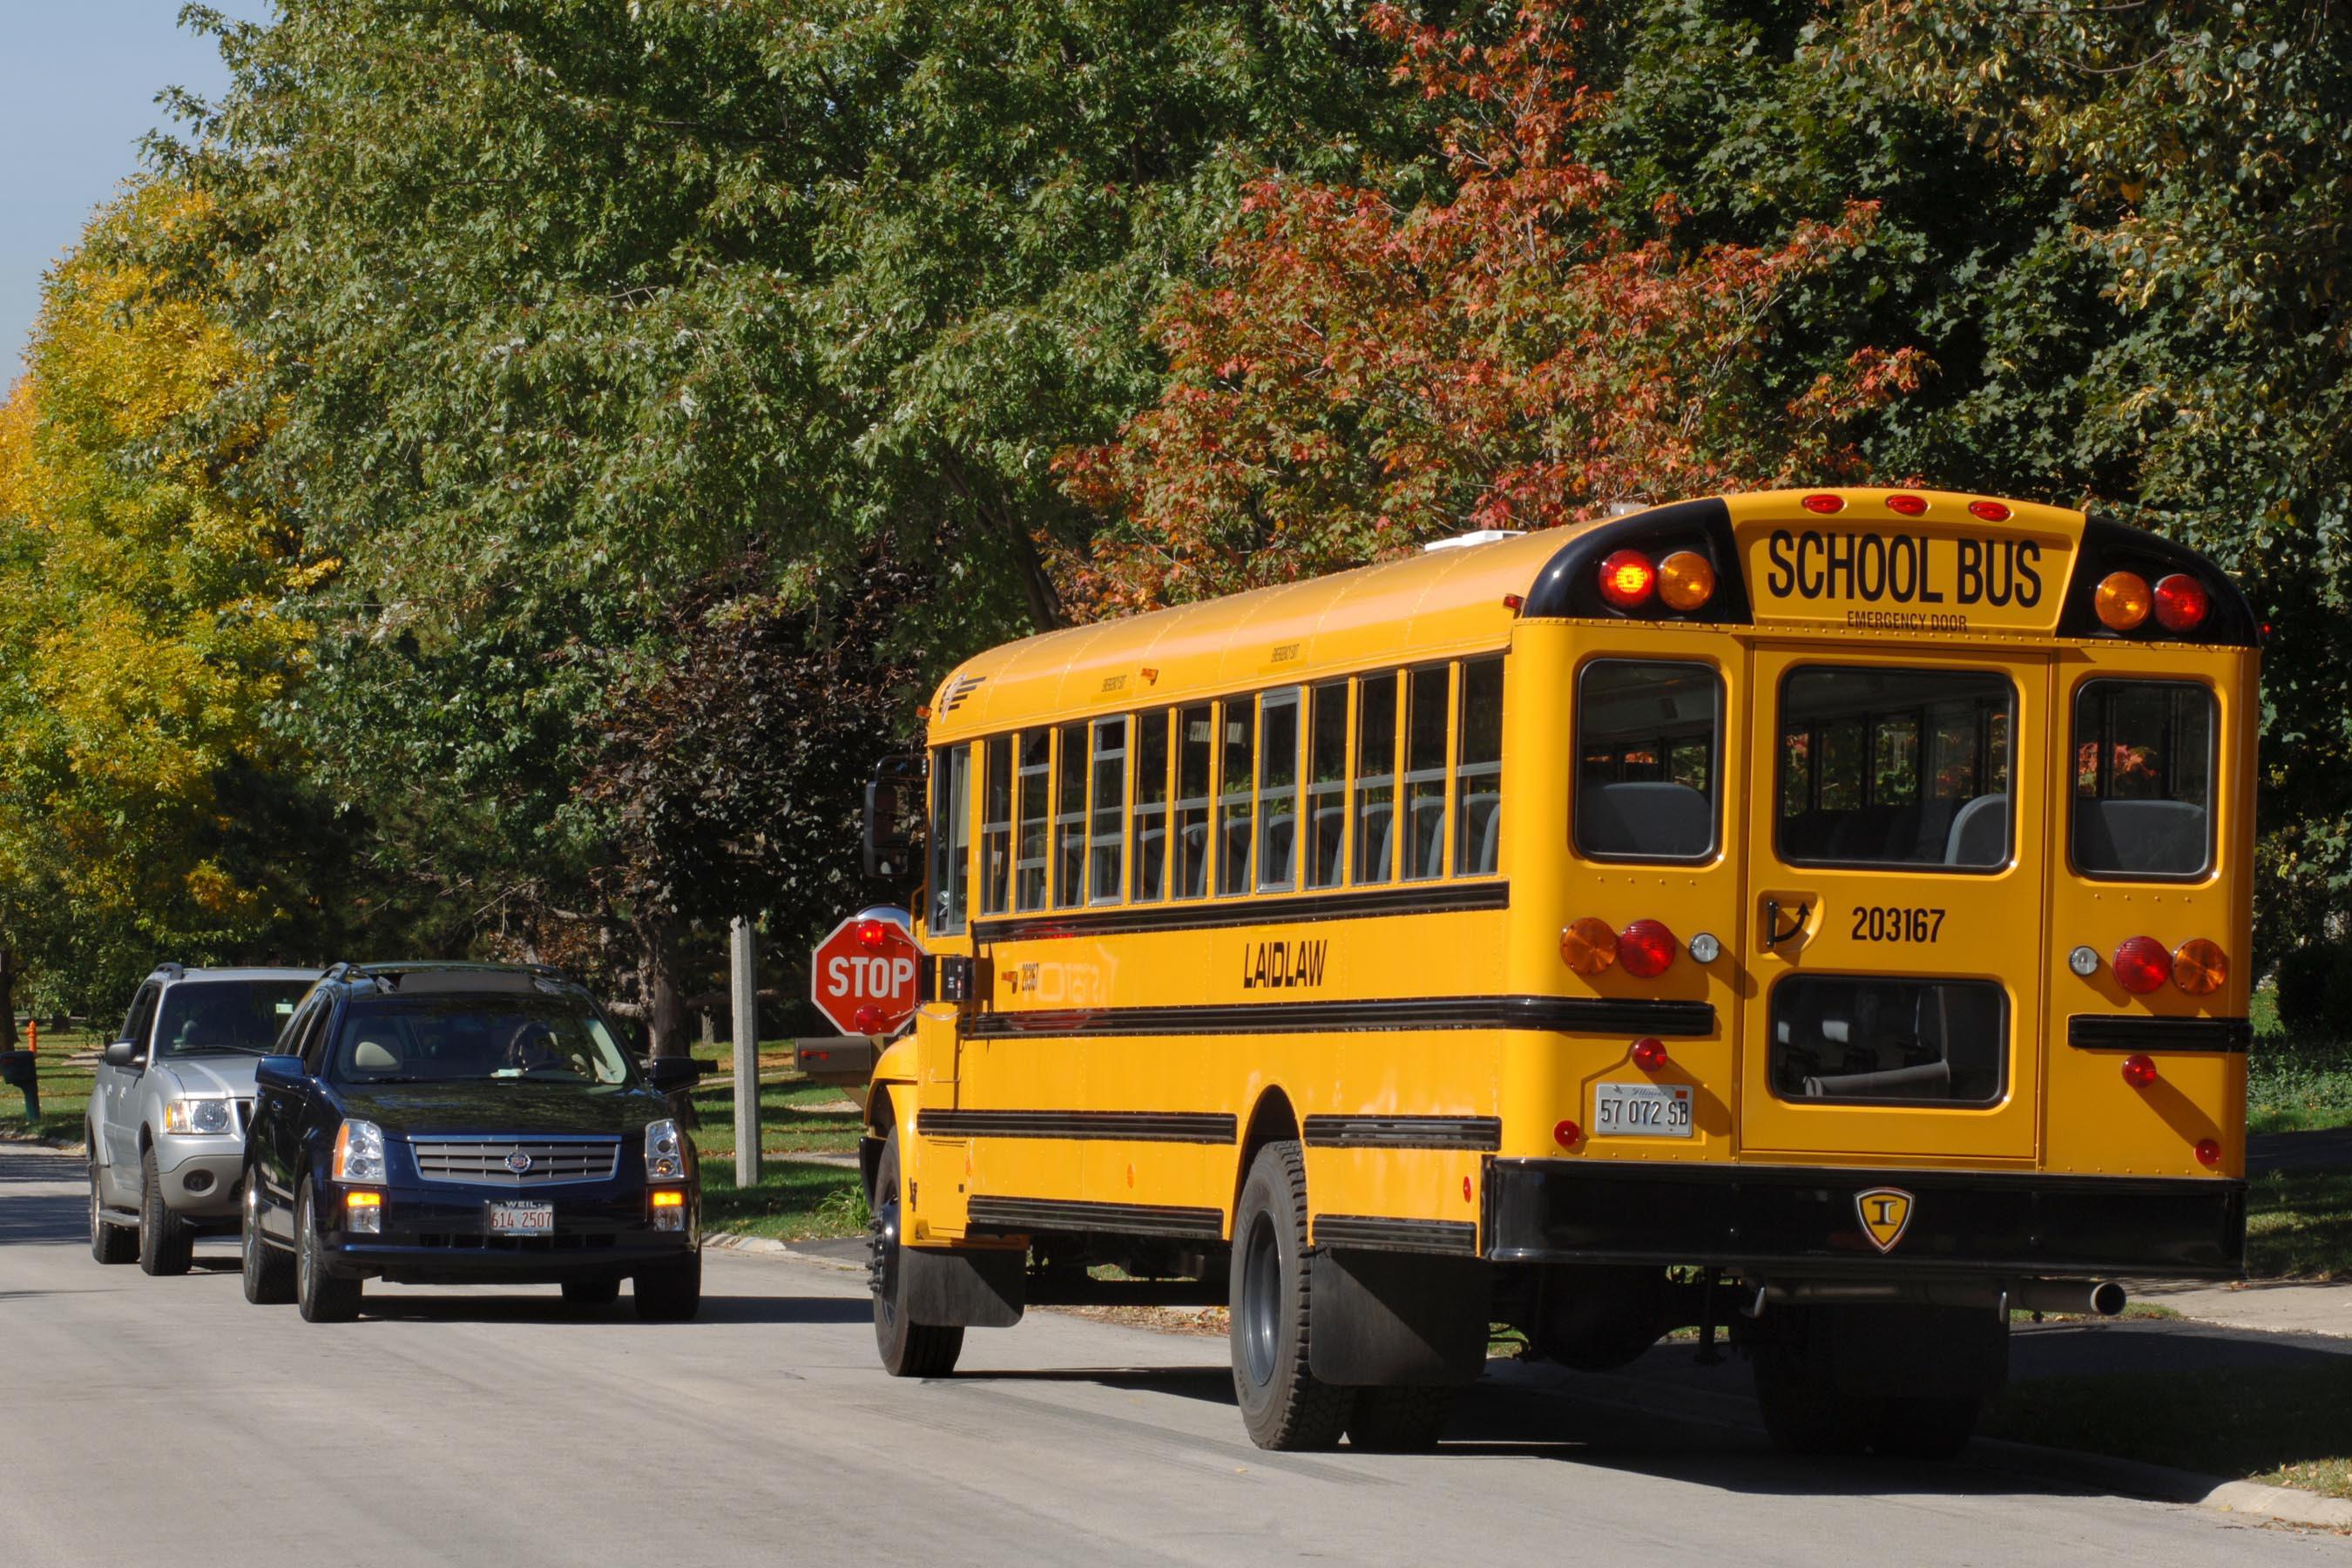 School bus safety